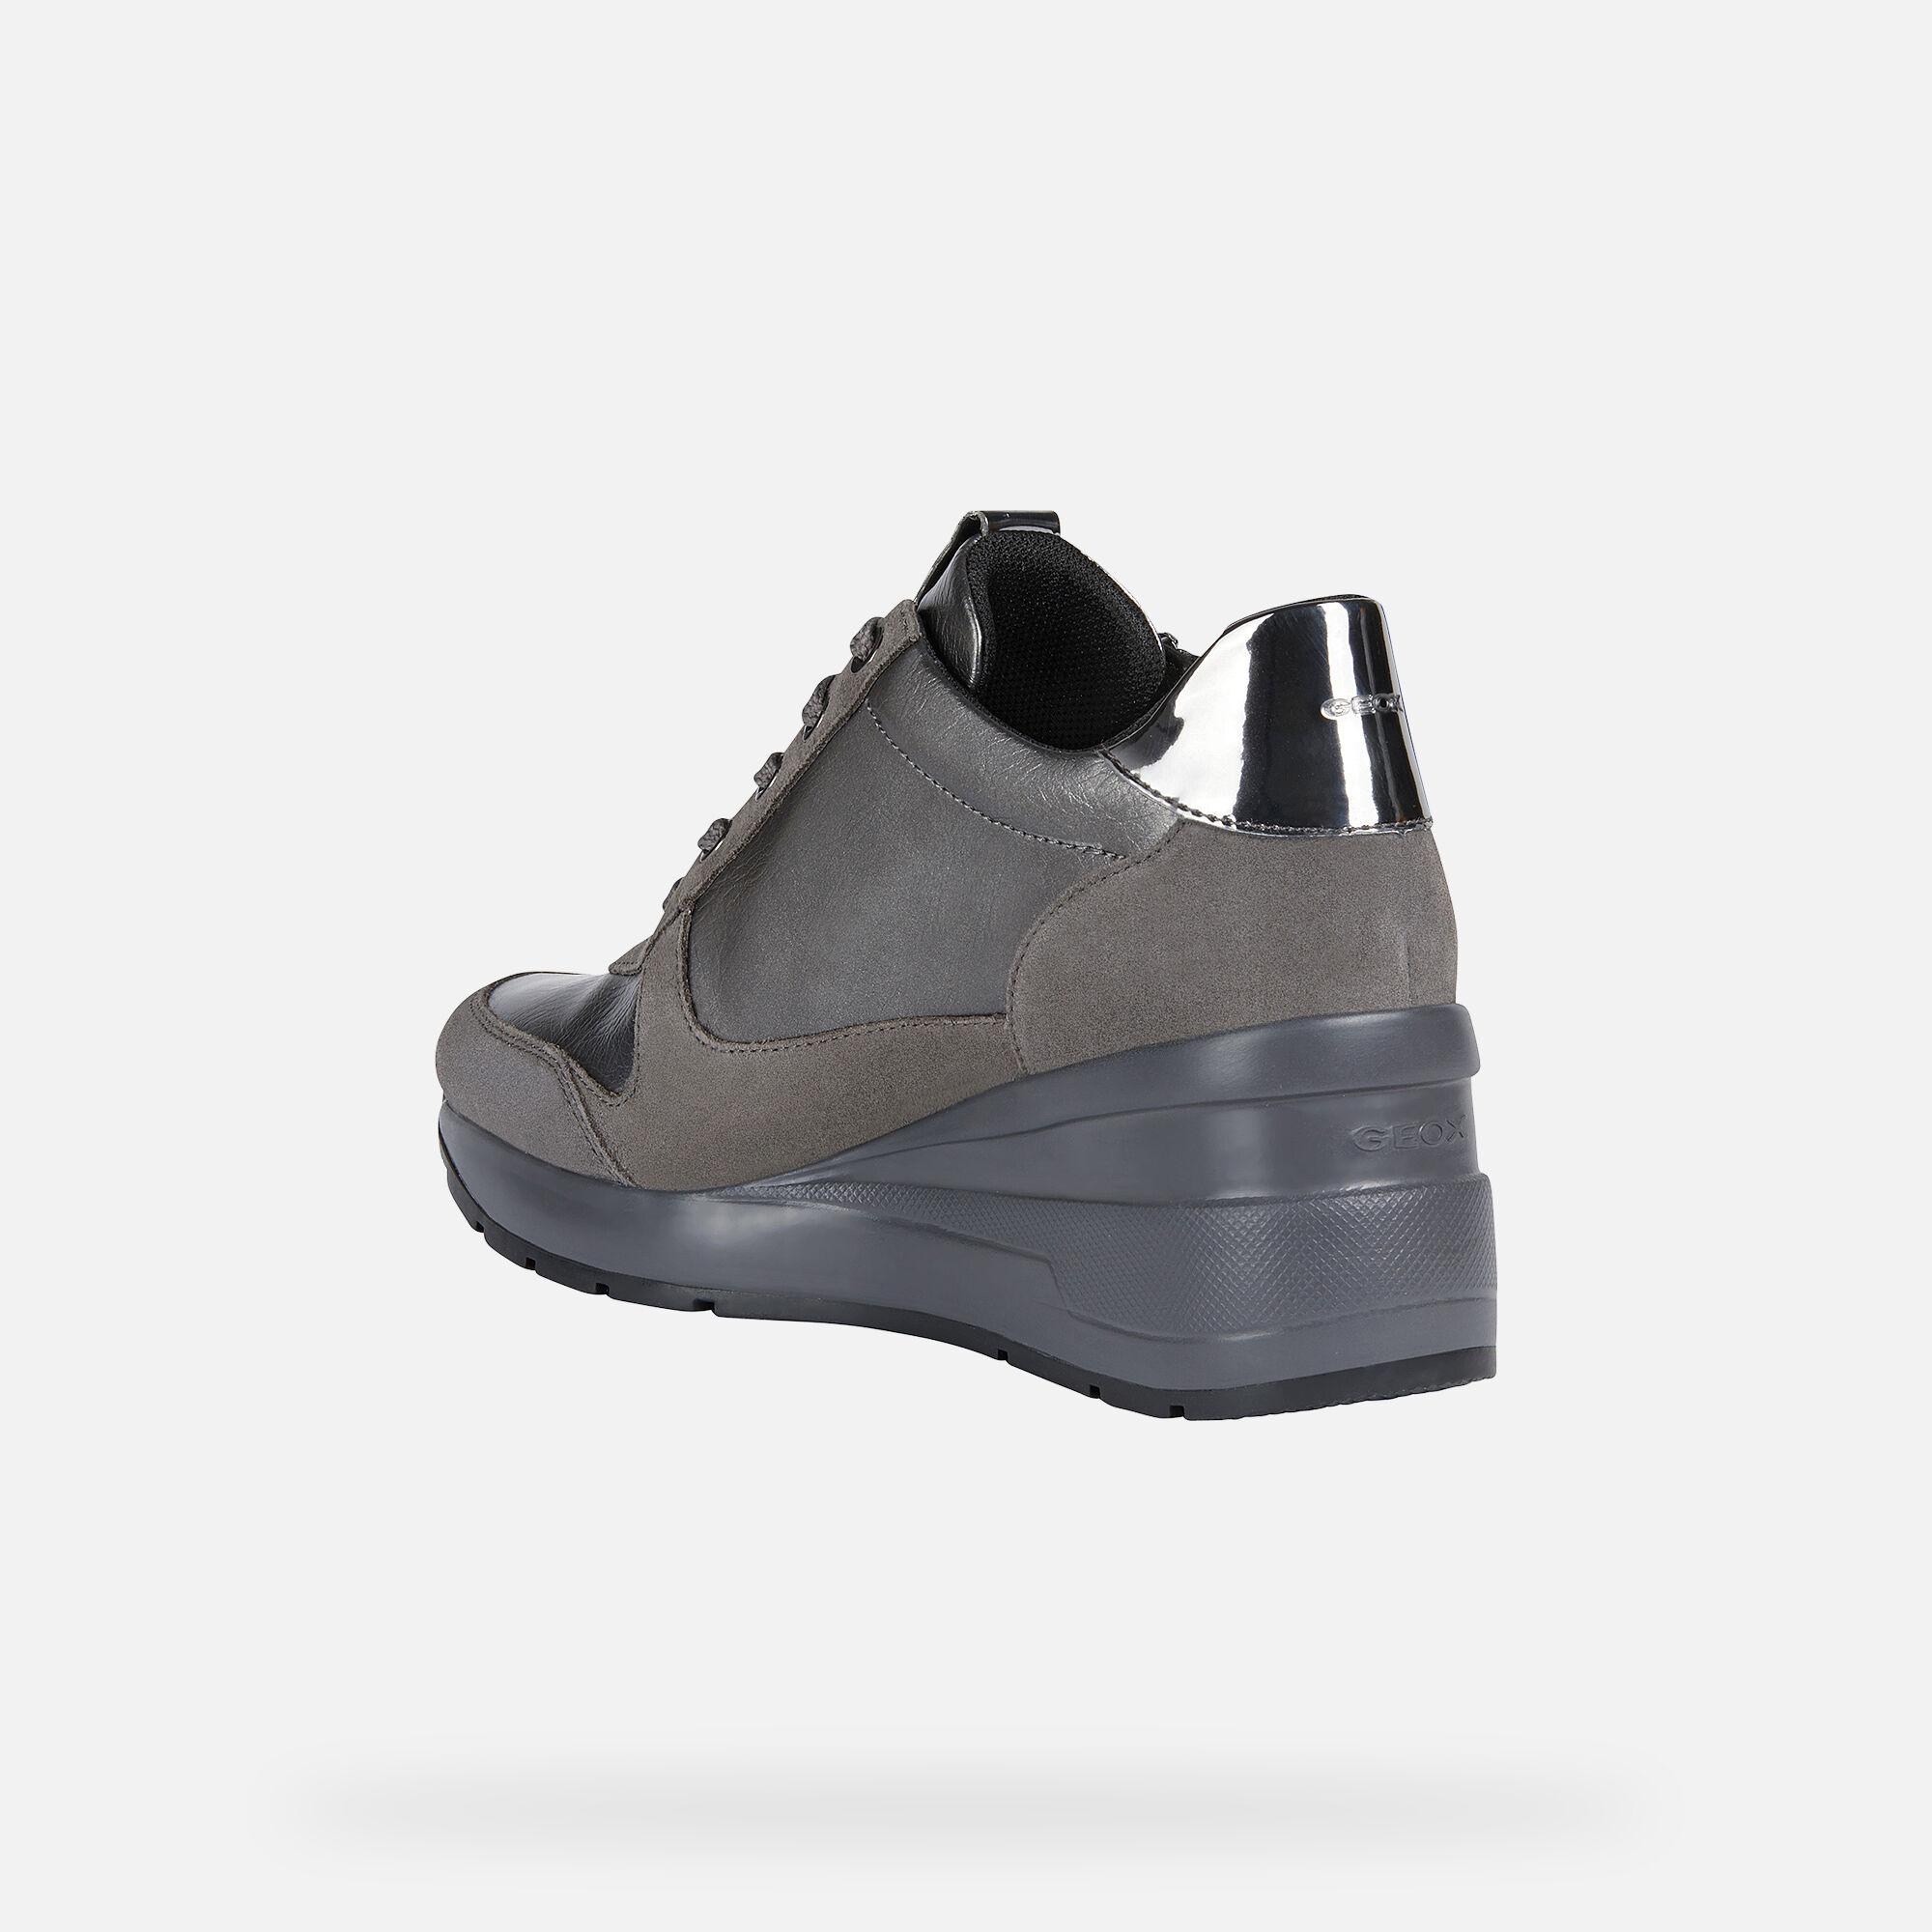 Geox ZOSMA Woman: Grey Sneakers | Geox